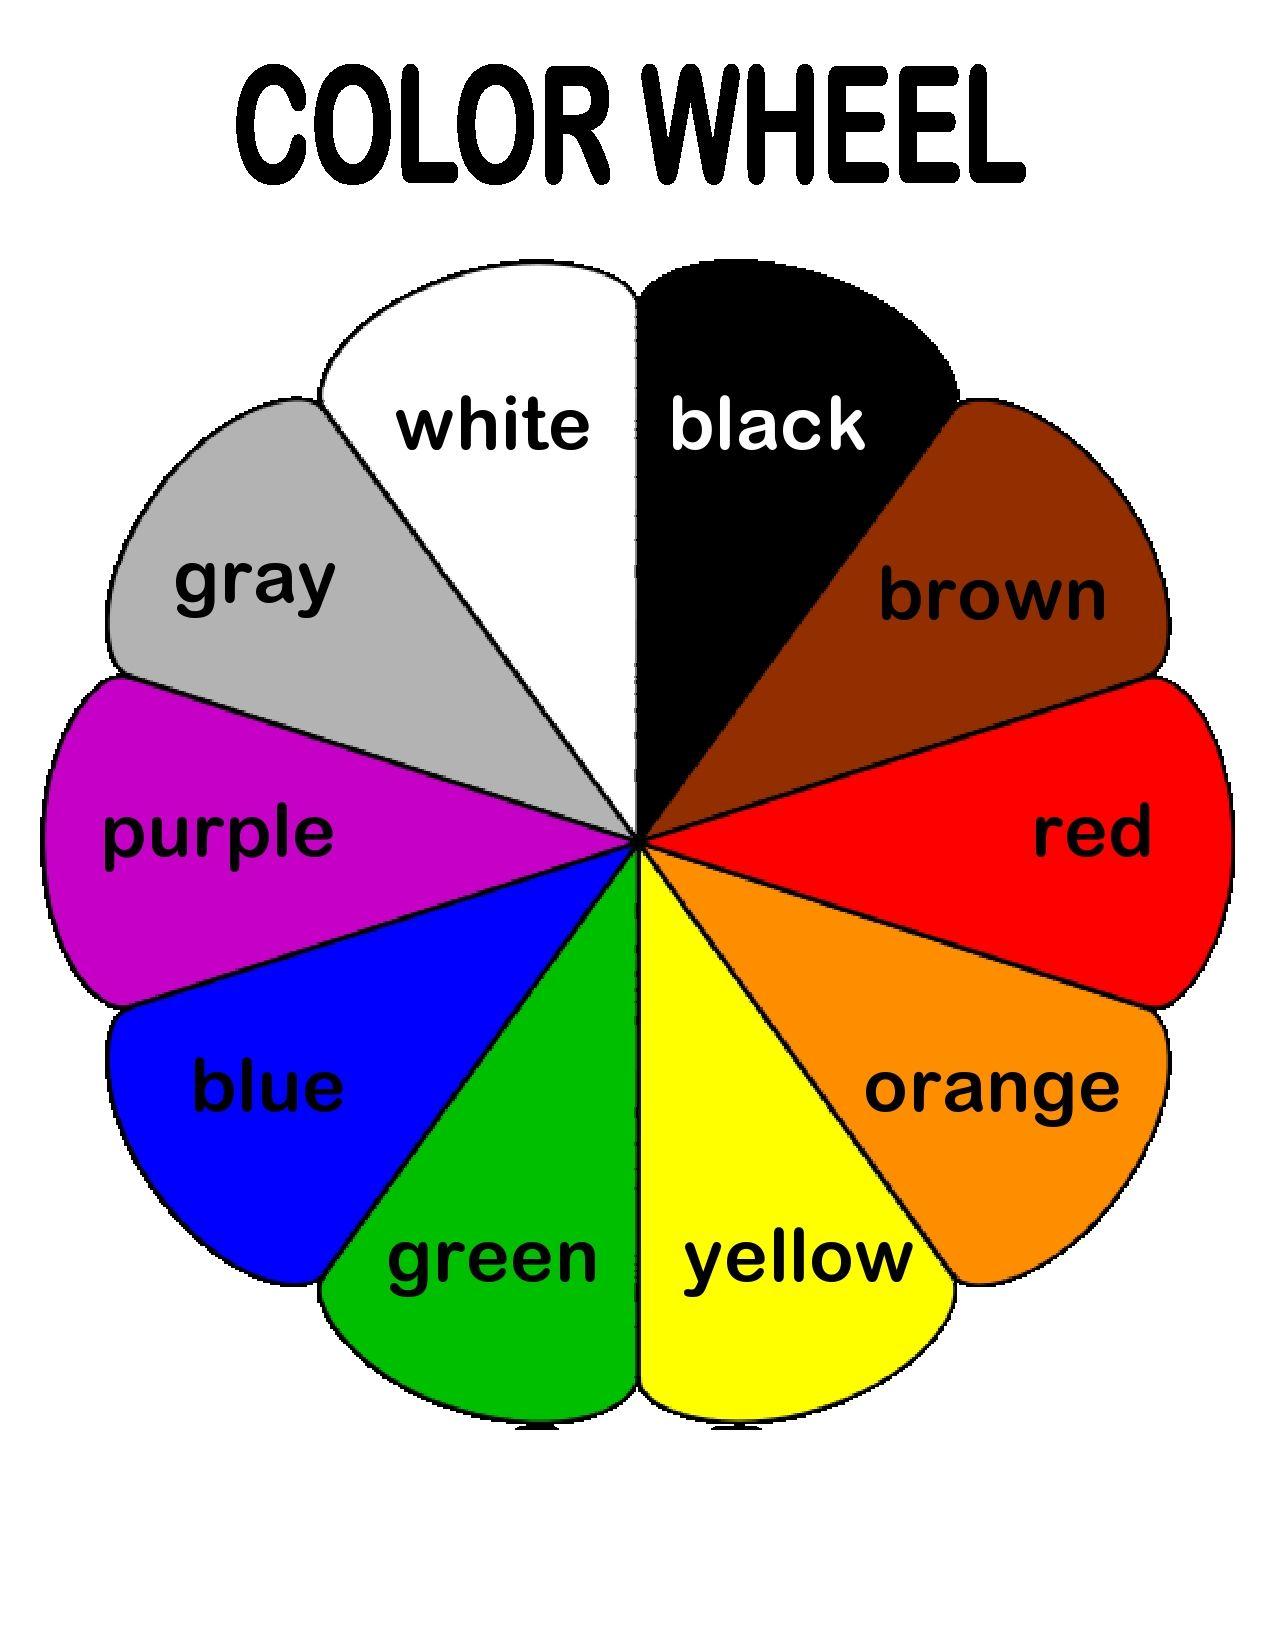 The Color Wheel Helps Preschoolers Associate Basic Colors